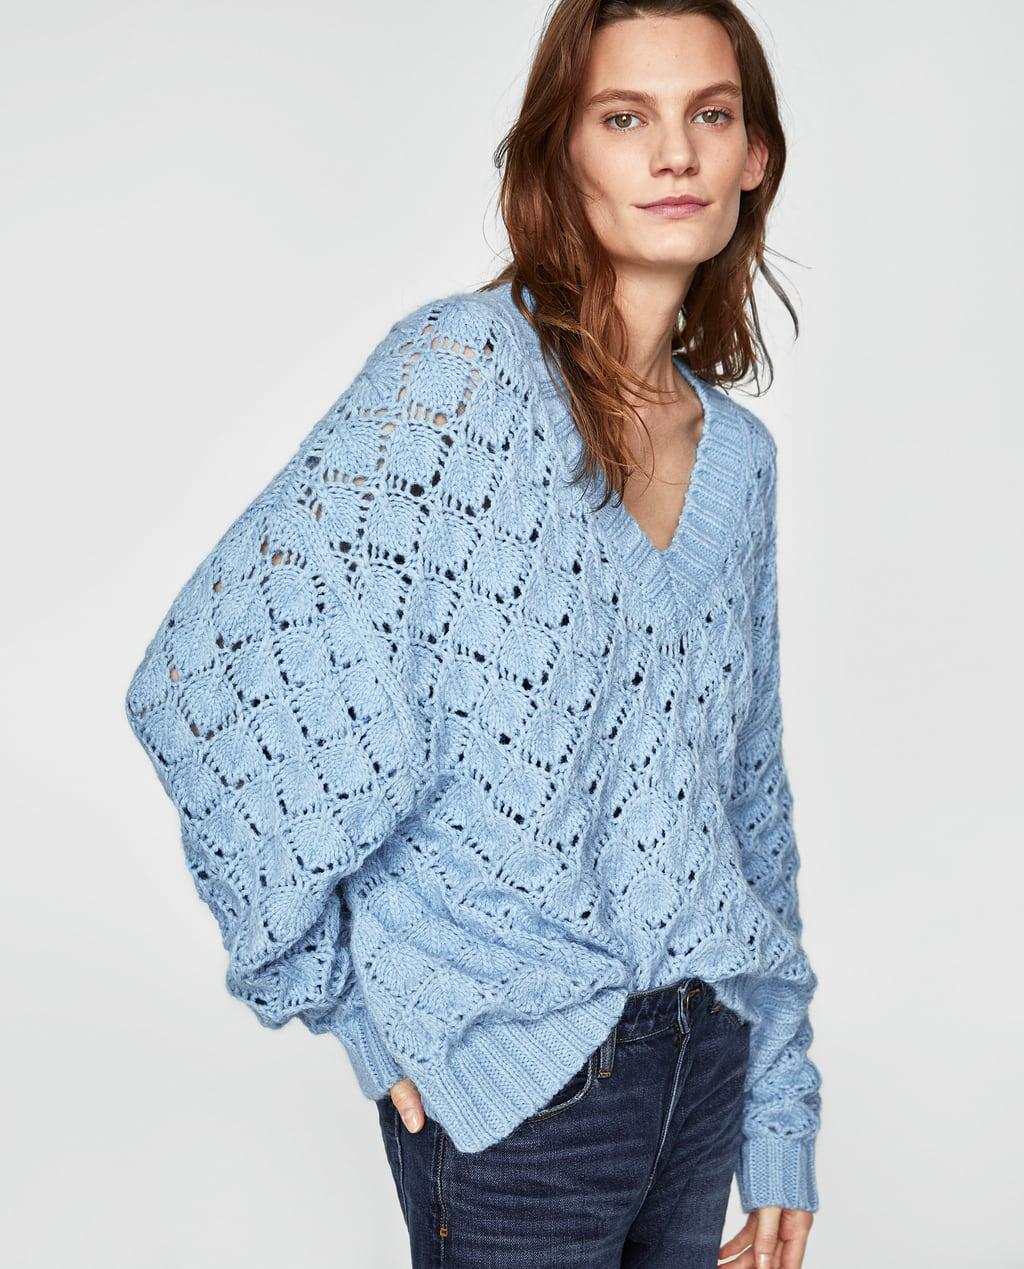 Zara-V-Neck-Openwork-Sweater.jpg